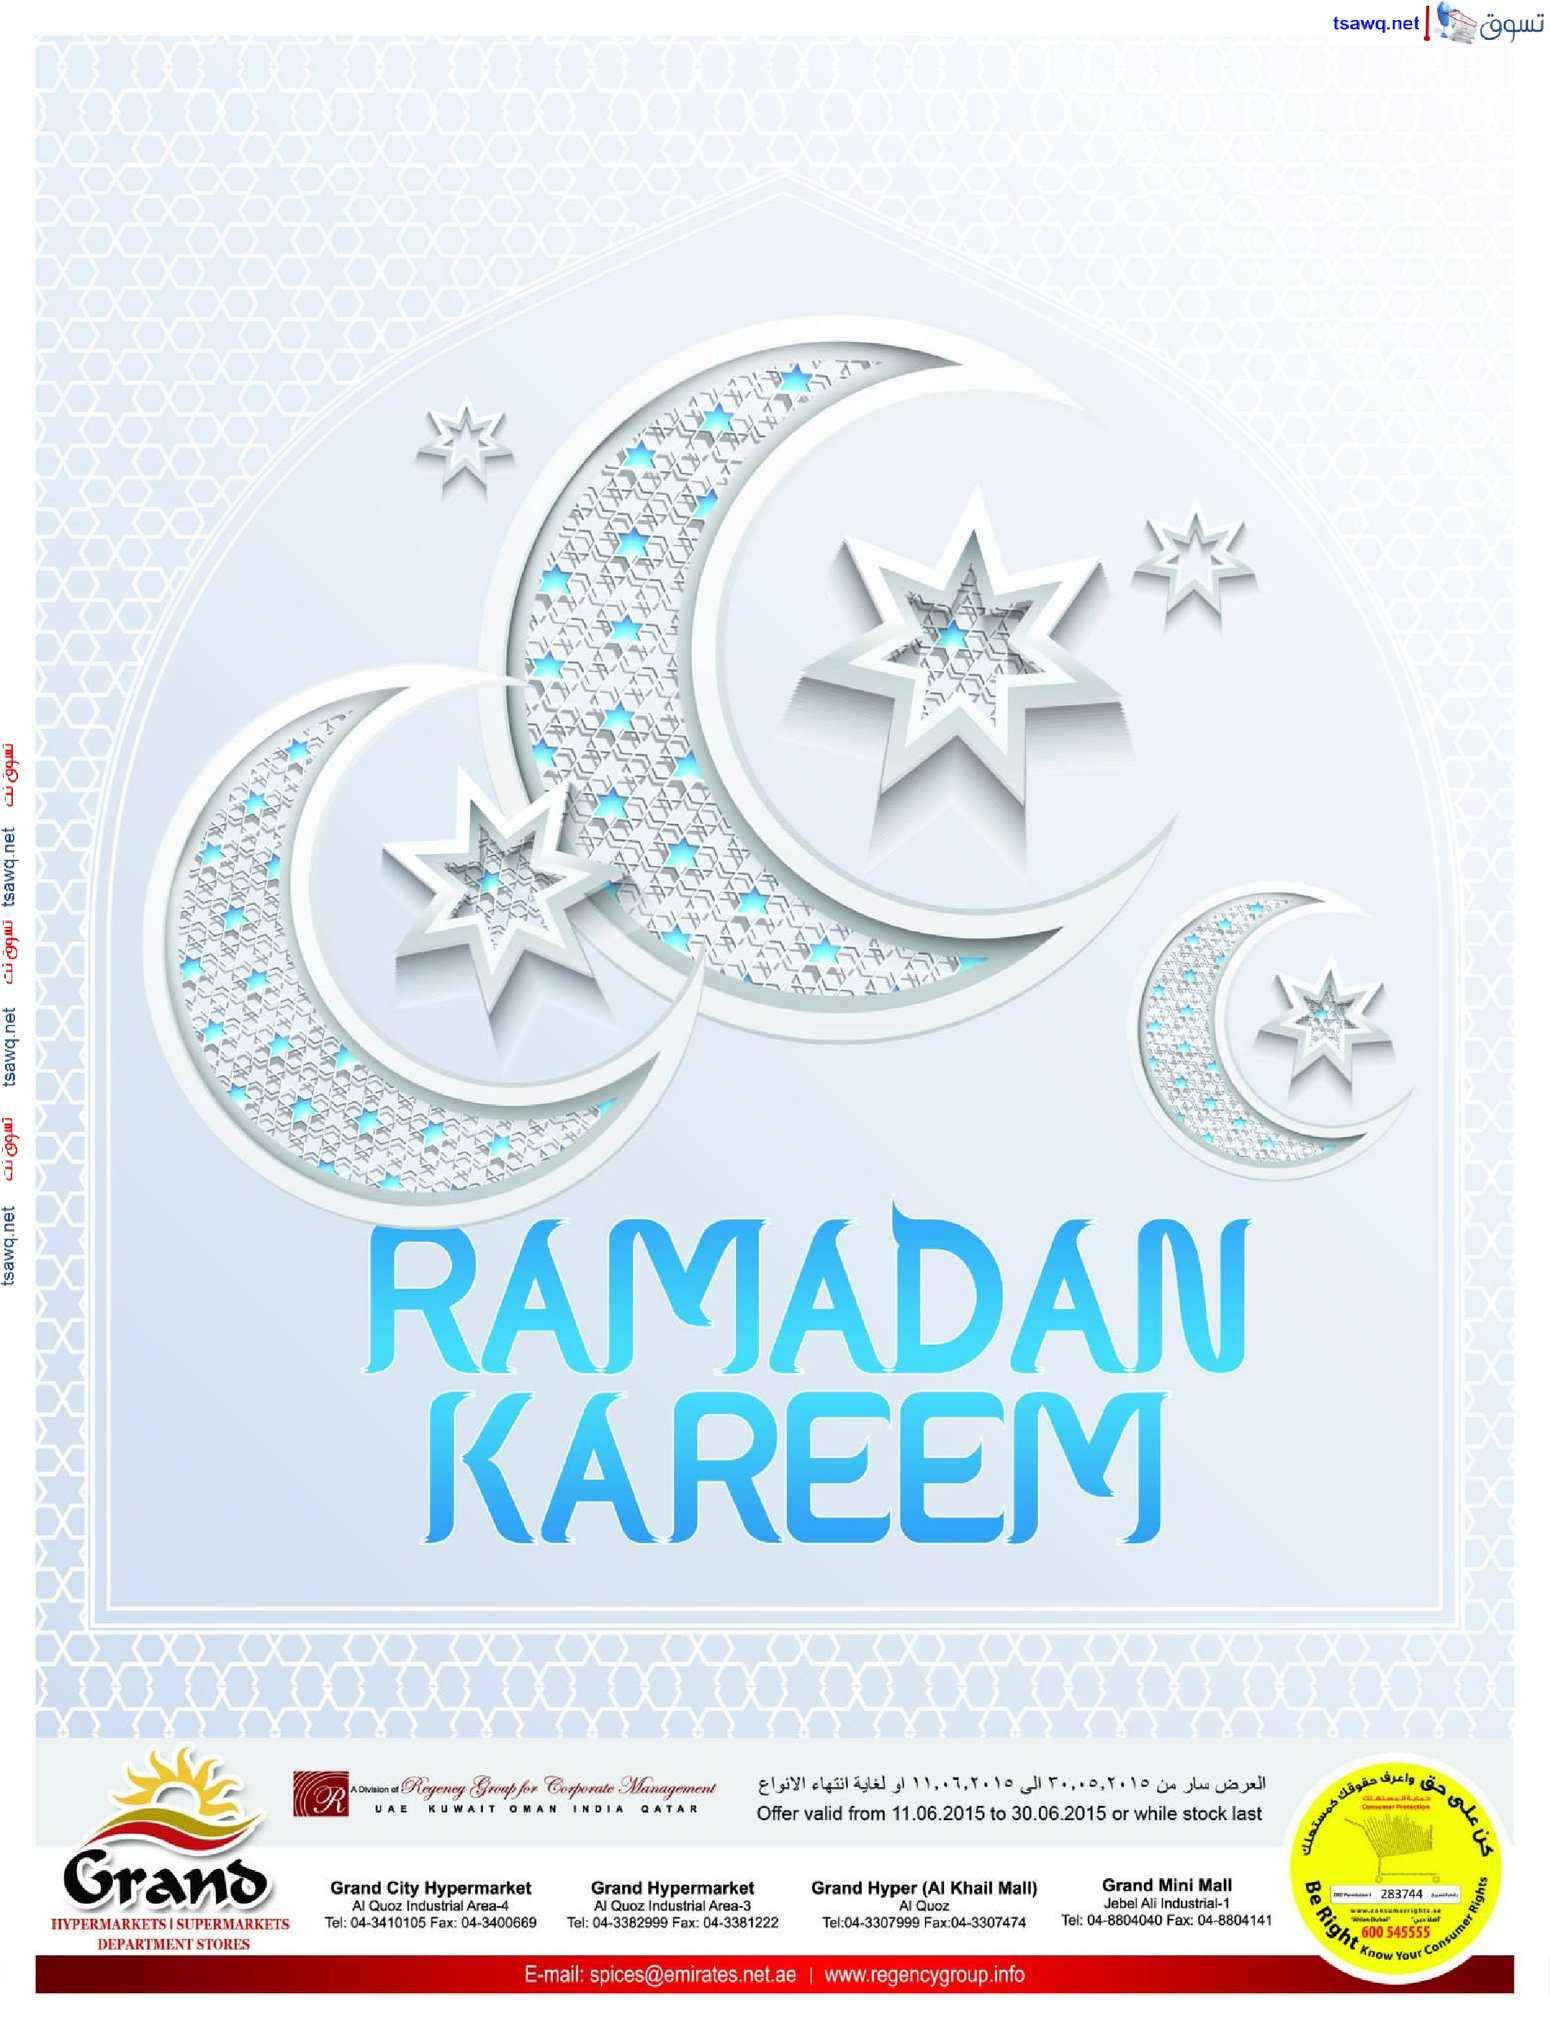 fa7c88a1a عروض جراند هايبر ماركت الإمارات من 11 يونيو حتى 30 يونيو 2015 رمضان كريم |  تسوق نت